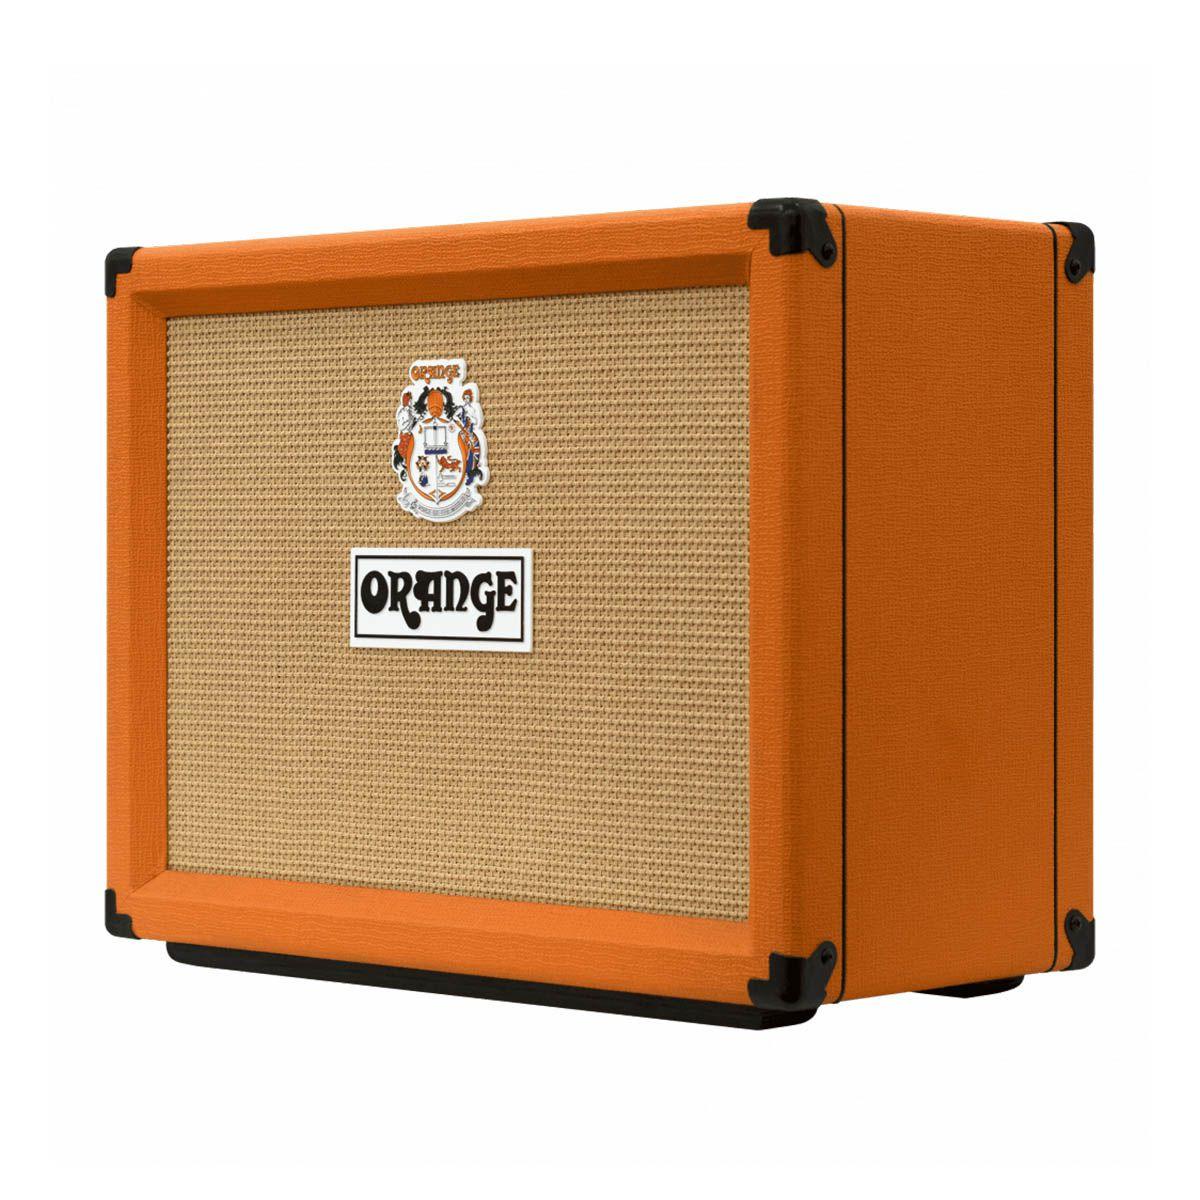 Caixa Amplificada Orange Tremlord 30W 1x12 para Guitarra